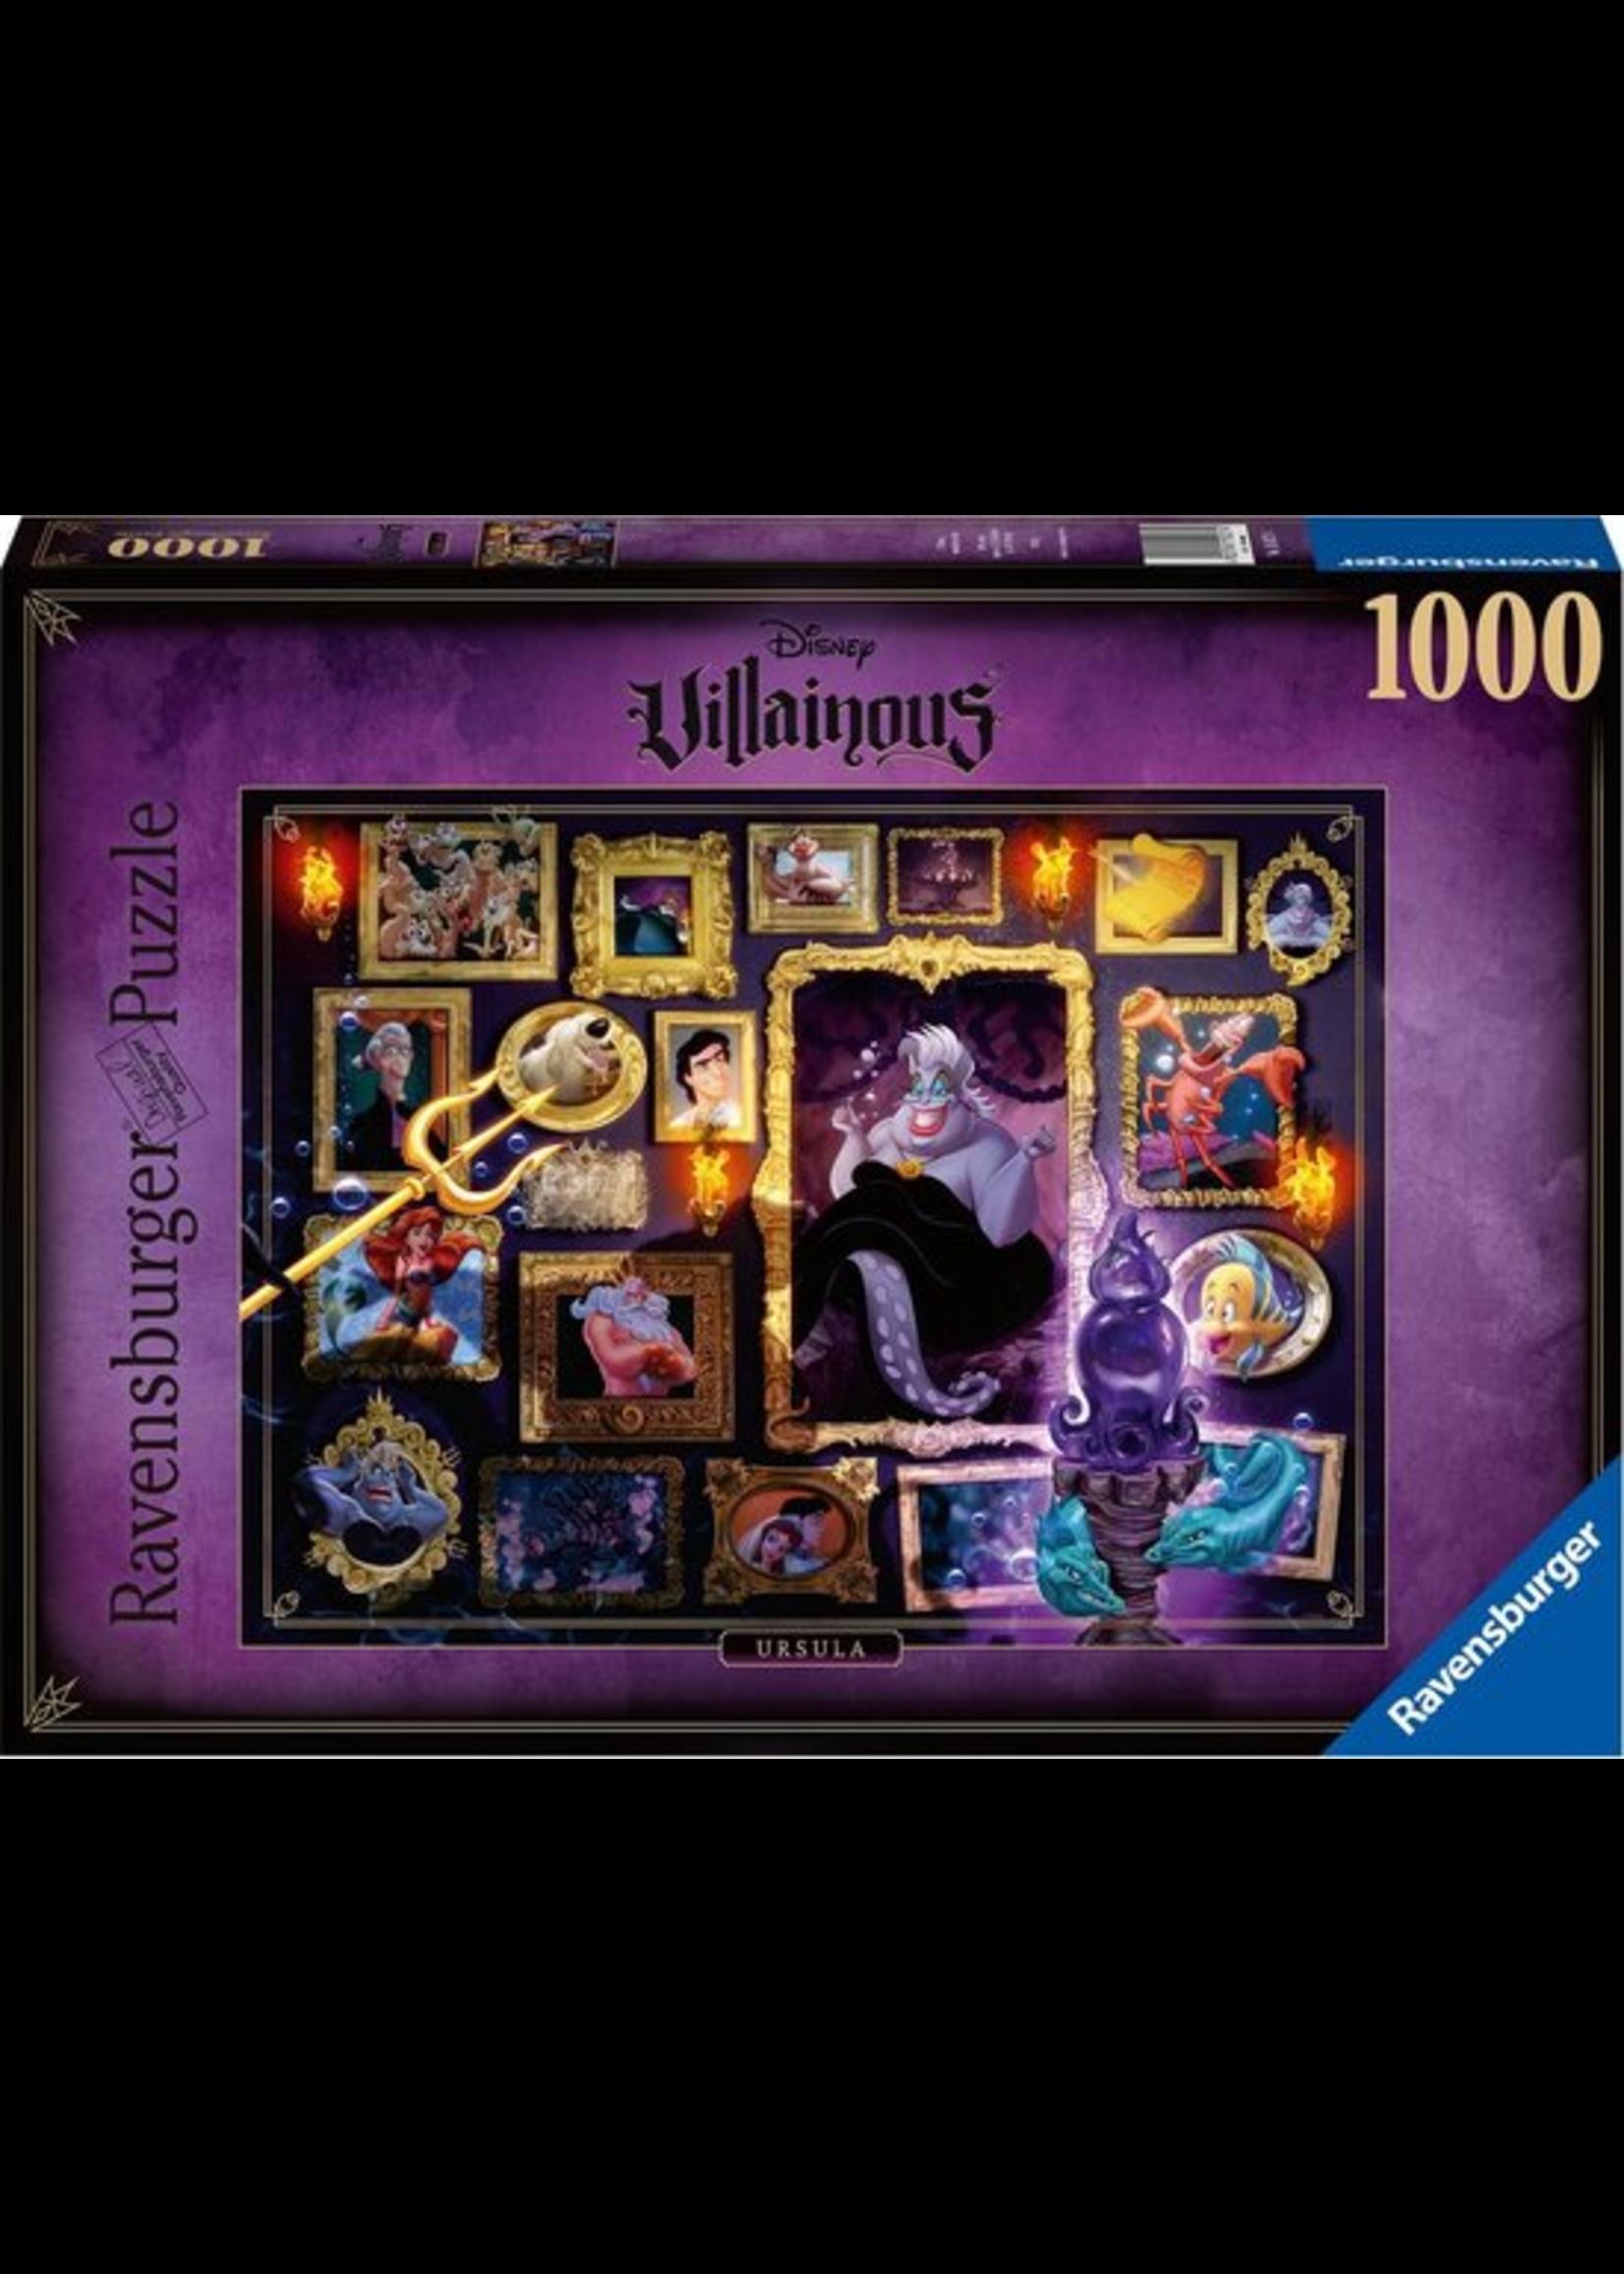 Disney Villainous - Ursula (1000)